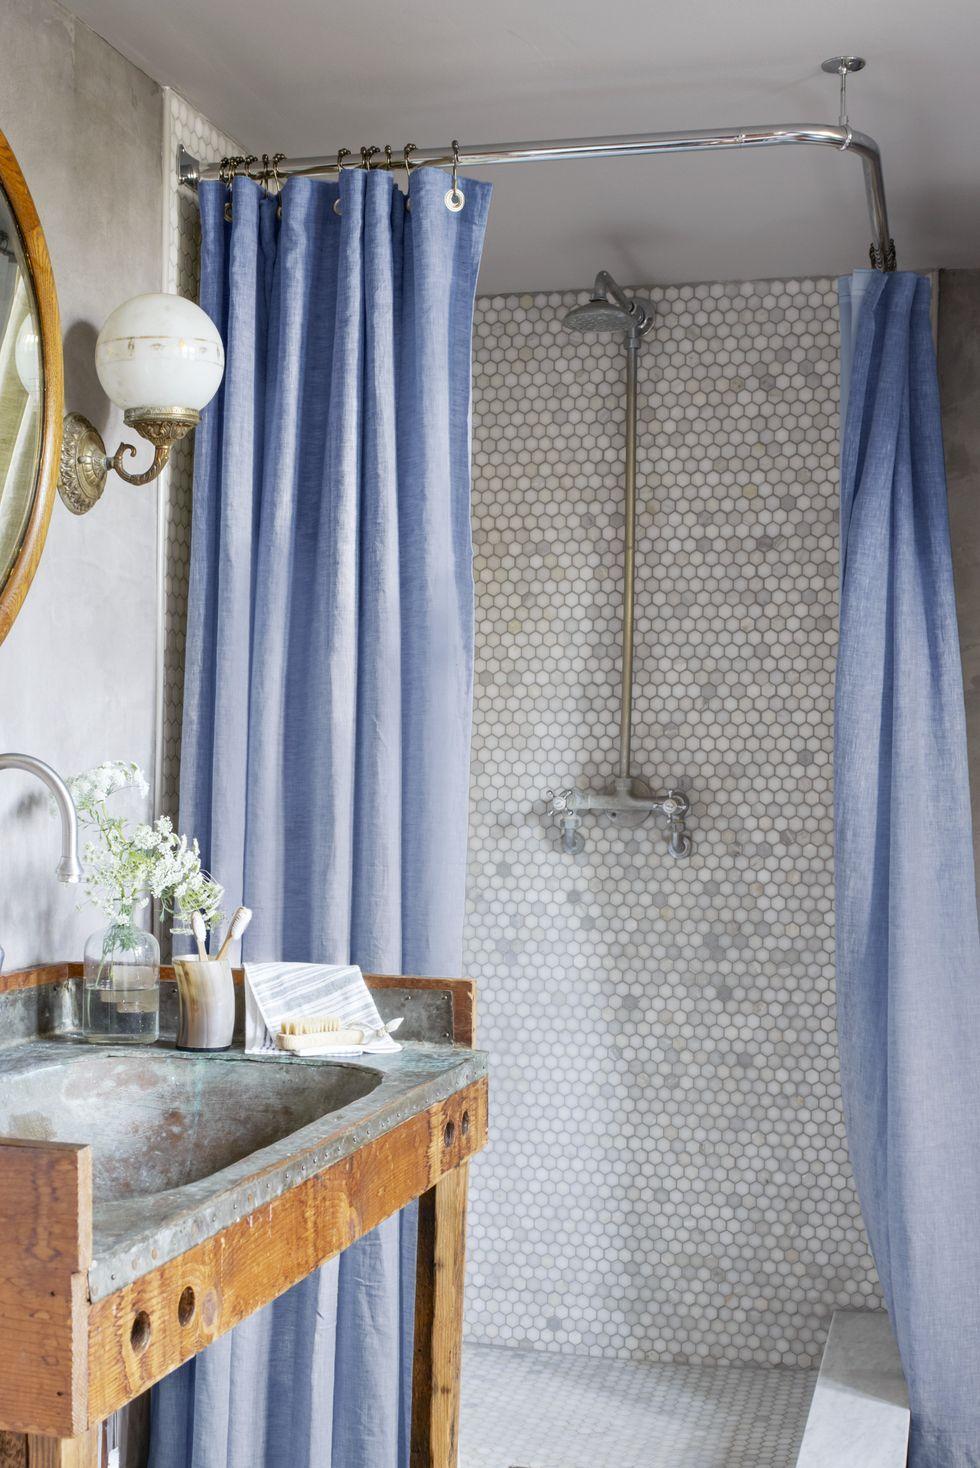 20 Popular Bathroom Tile Ideas Bathroom Wall And Floor Tiles